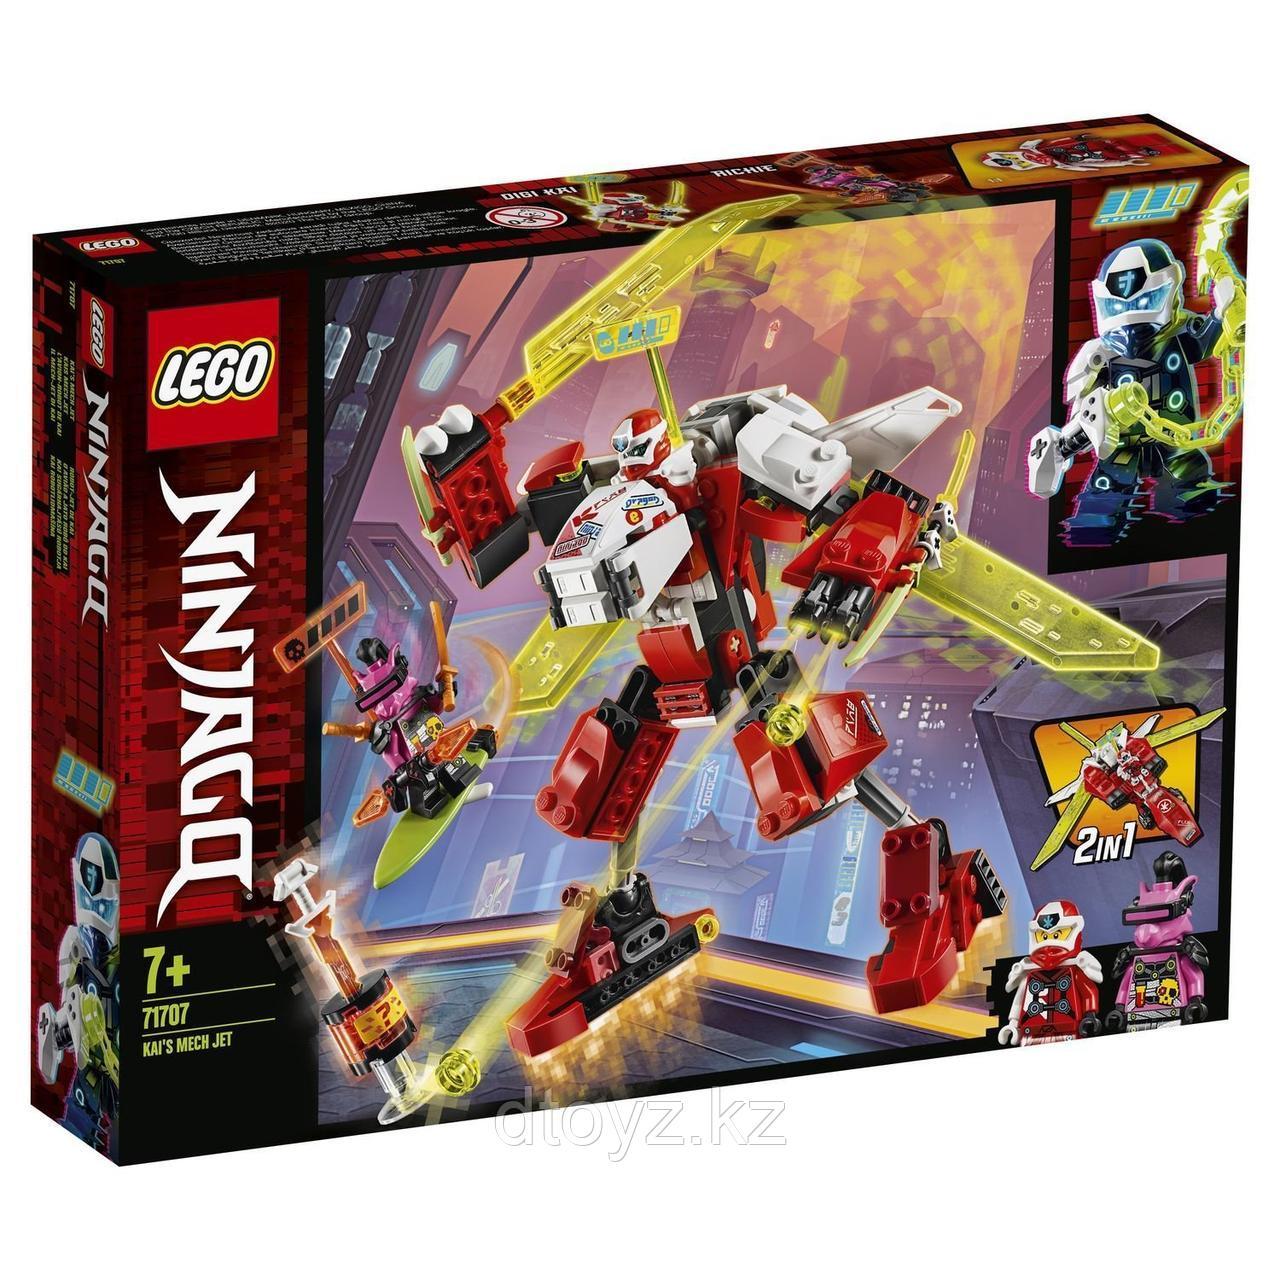 Lego Ninjago 71707 Реактивный самолет Кая